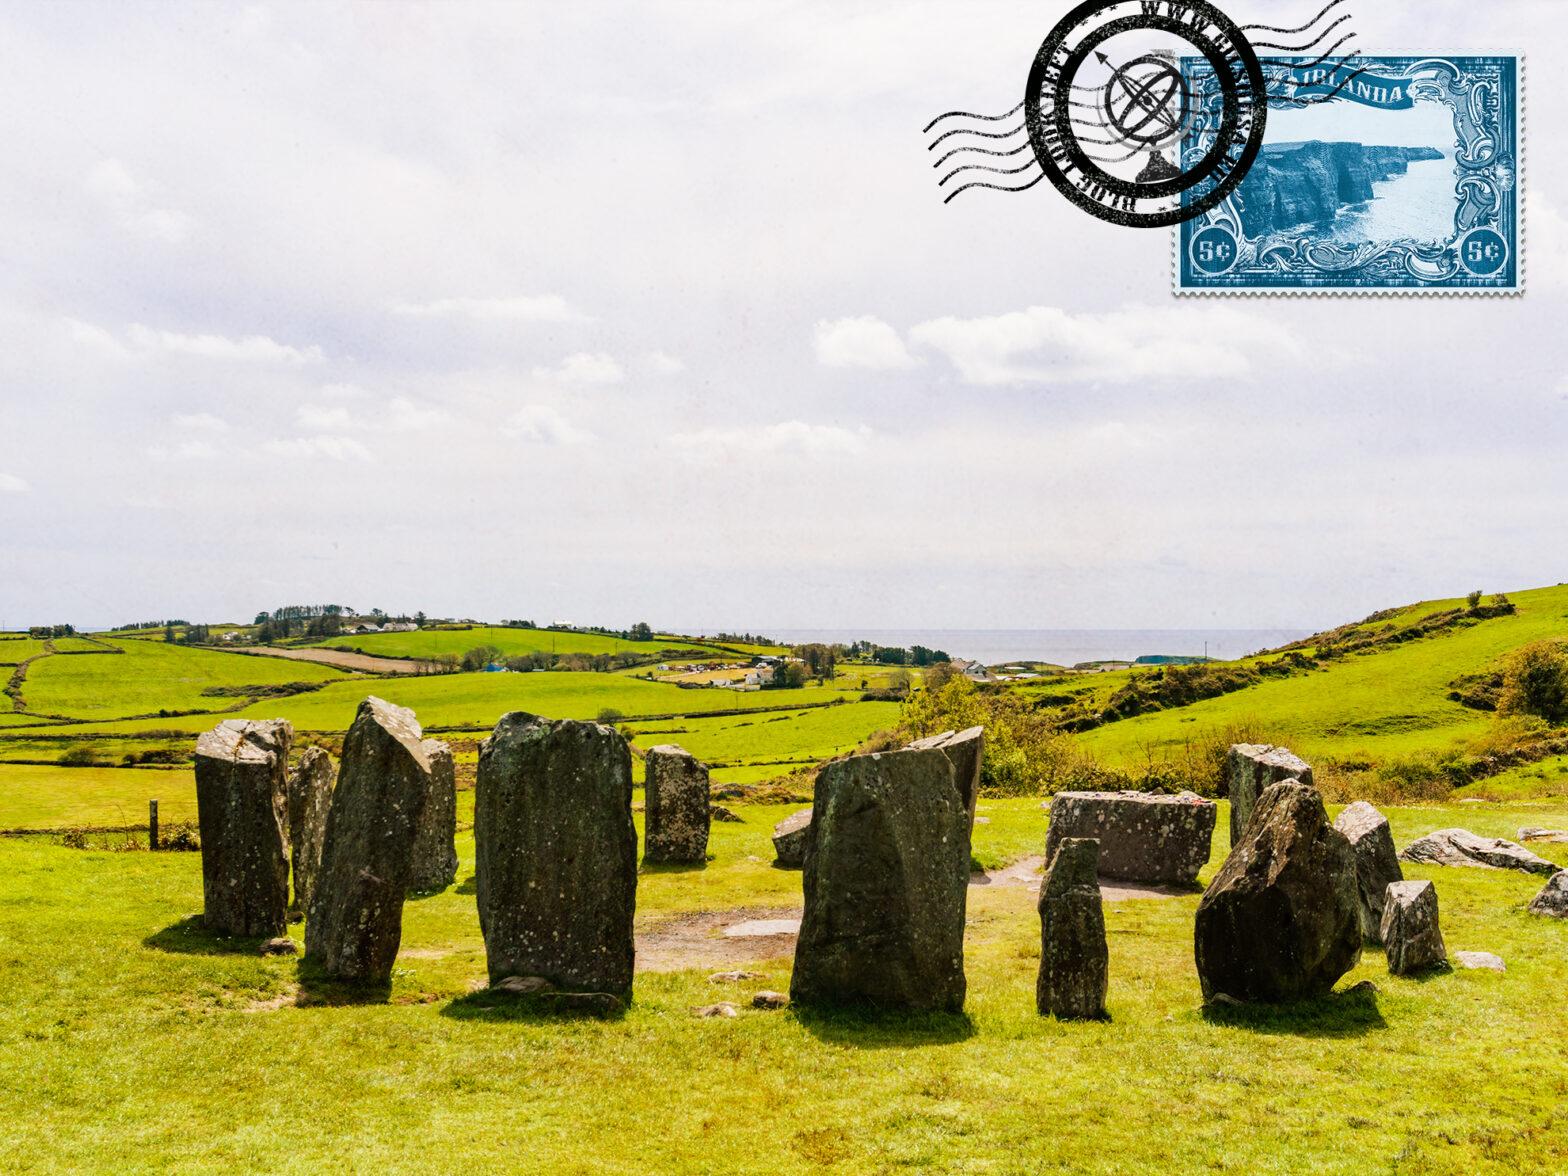 Visitar Drombeg, o Círculo de Pedras Megalítico perto de Cork